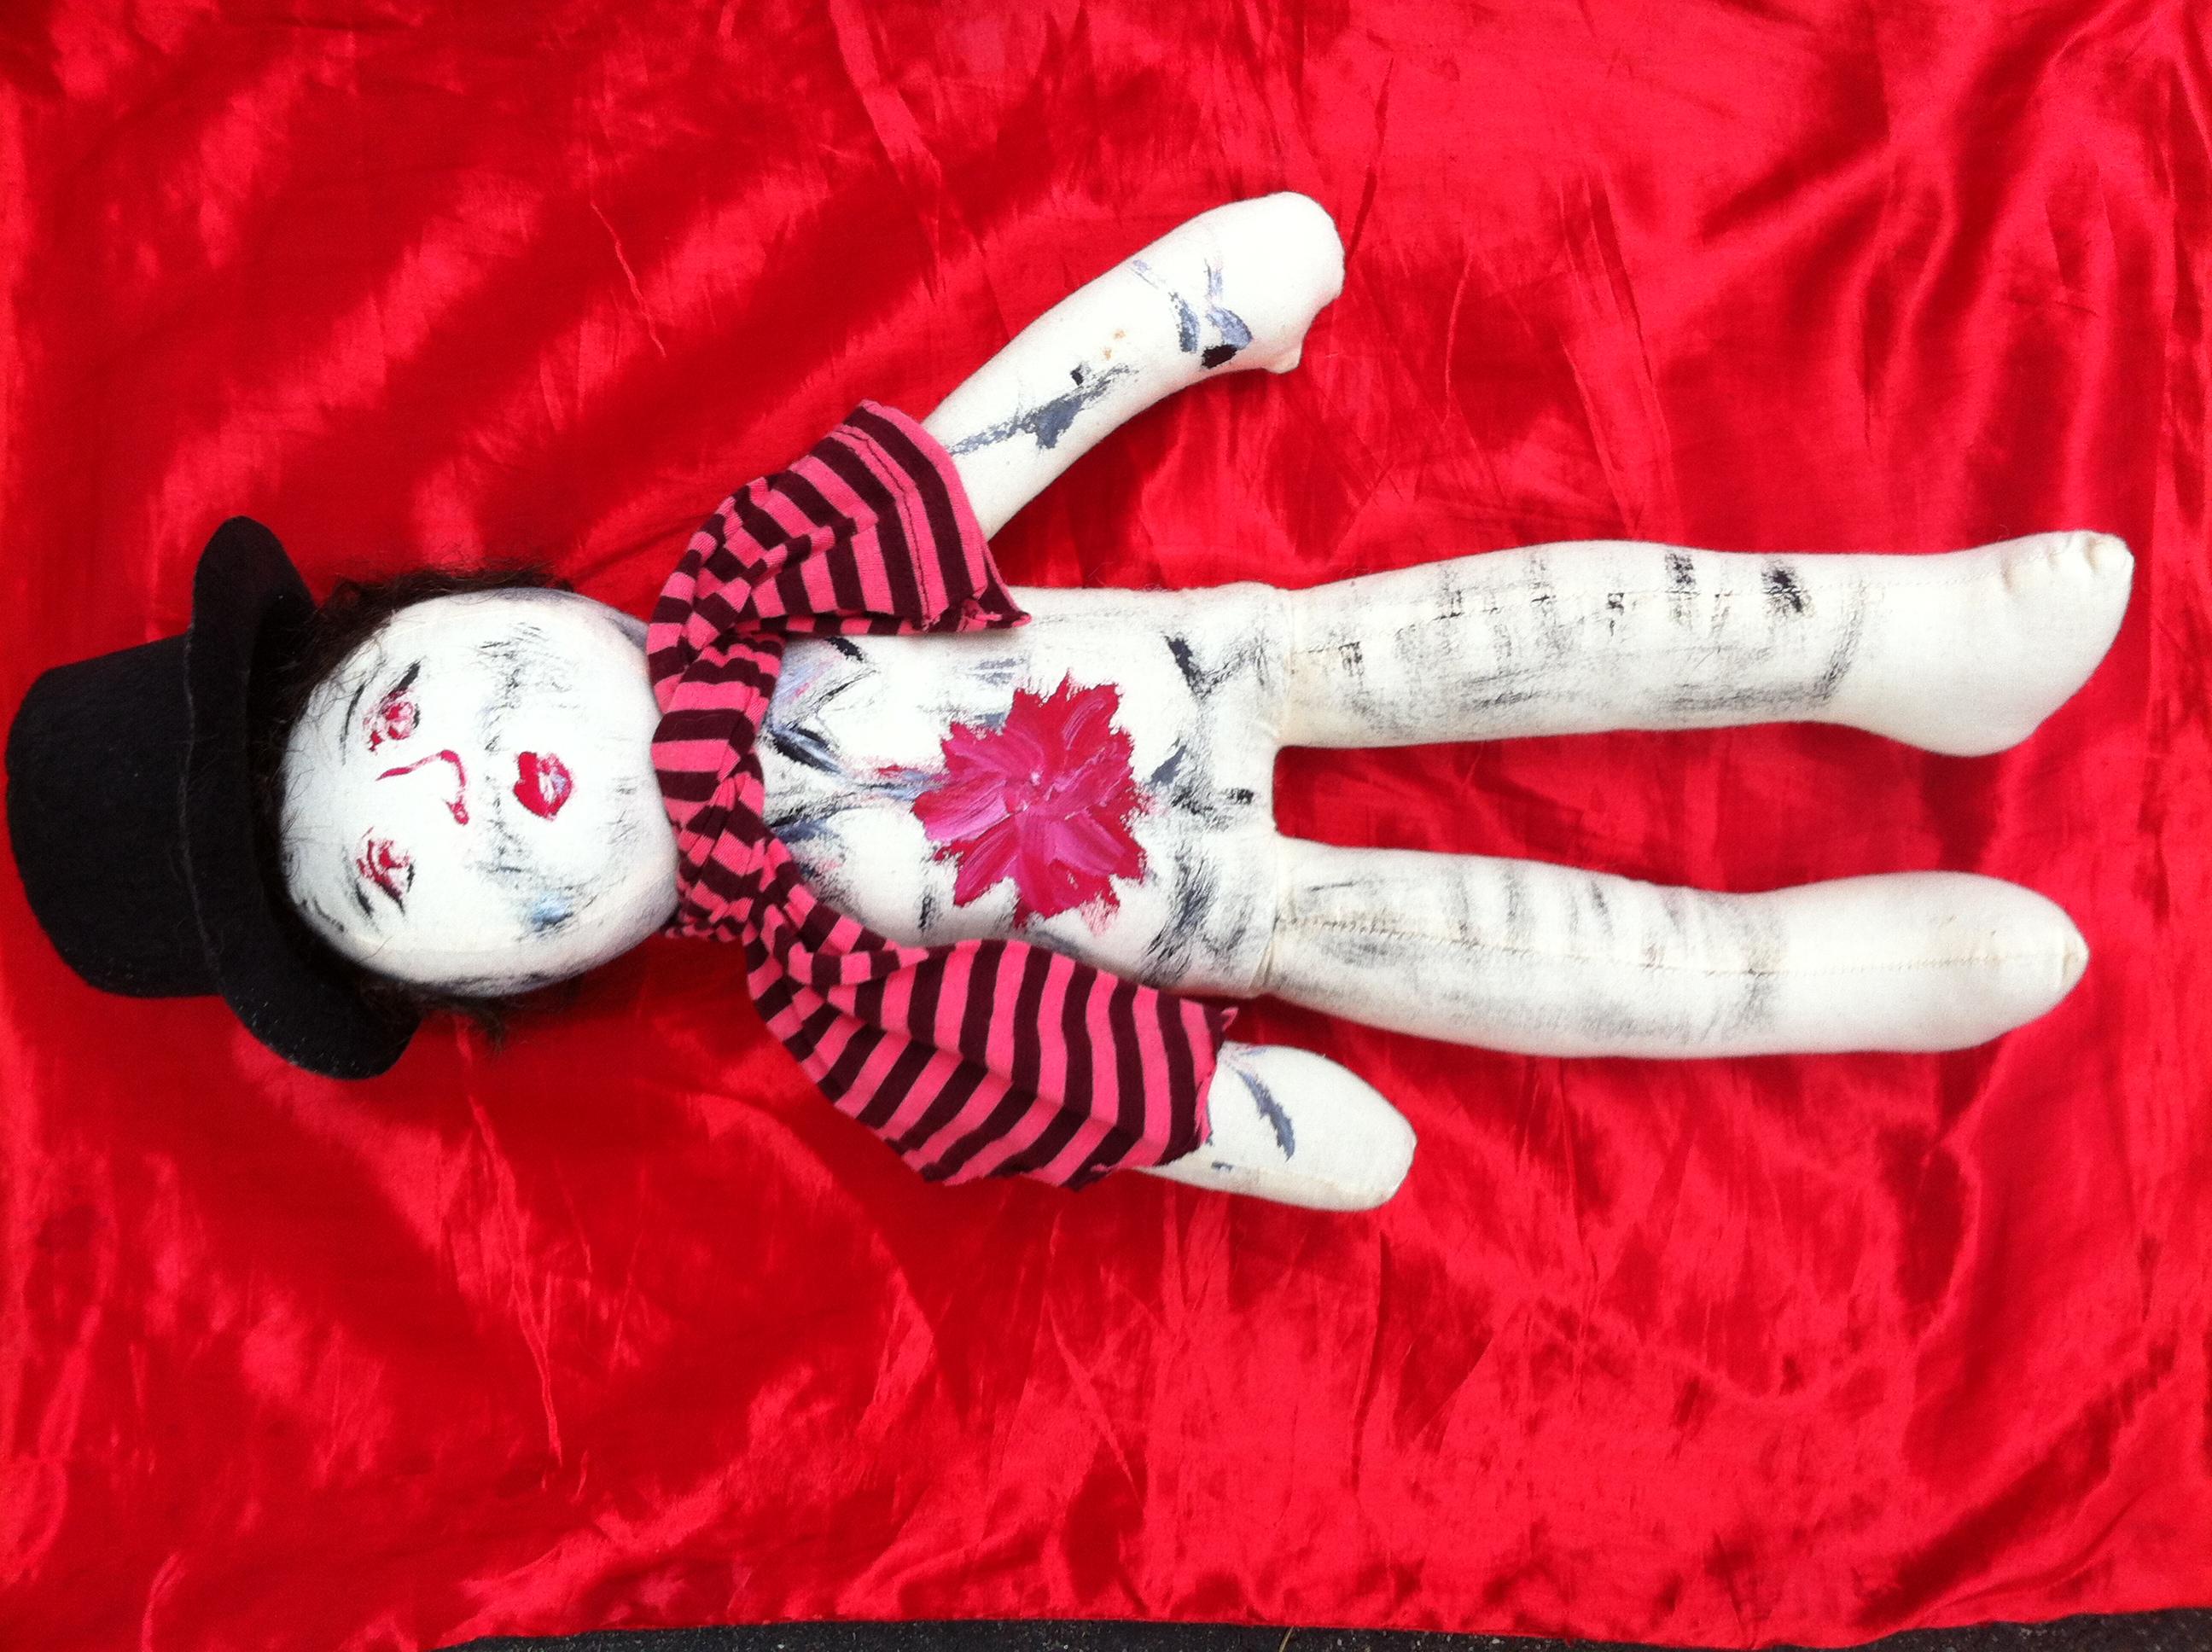 Magic Marc Doll by Gretchen Seichrist - 2013